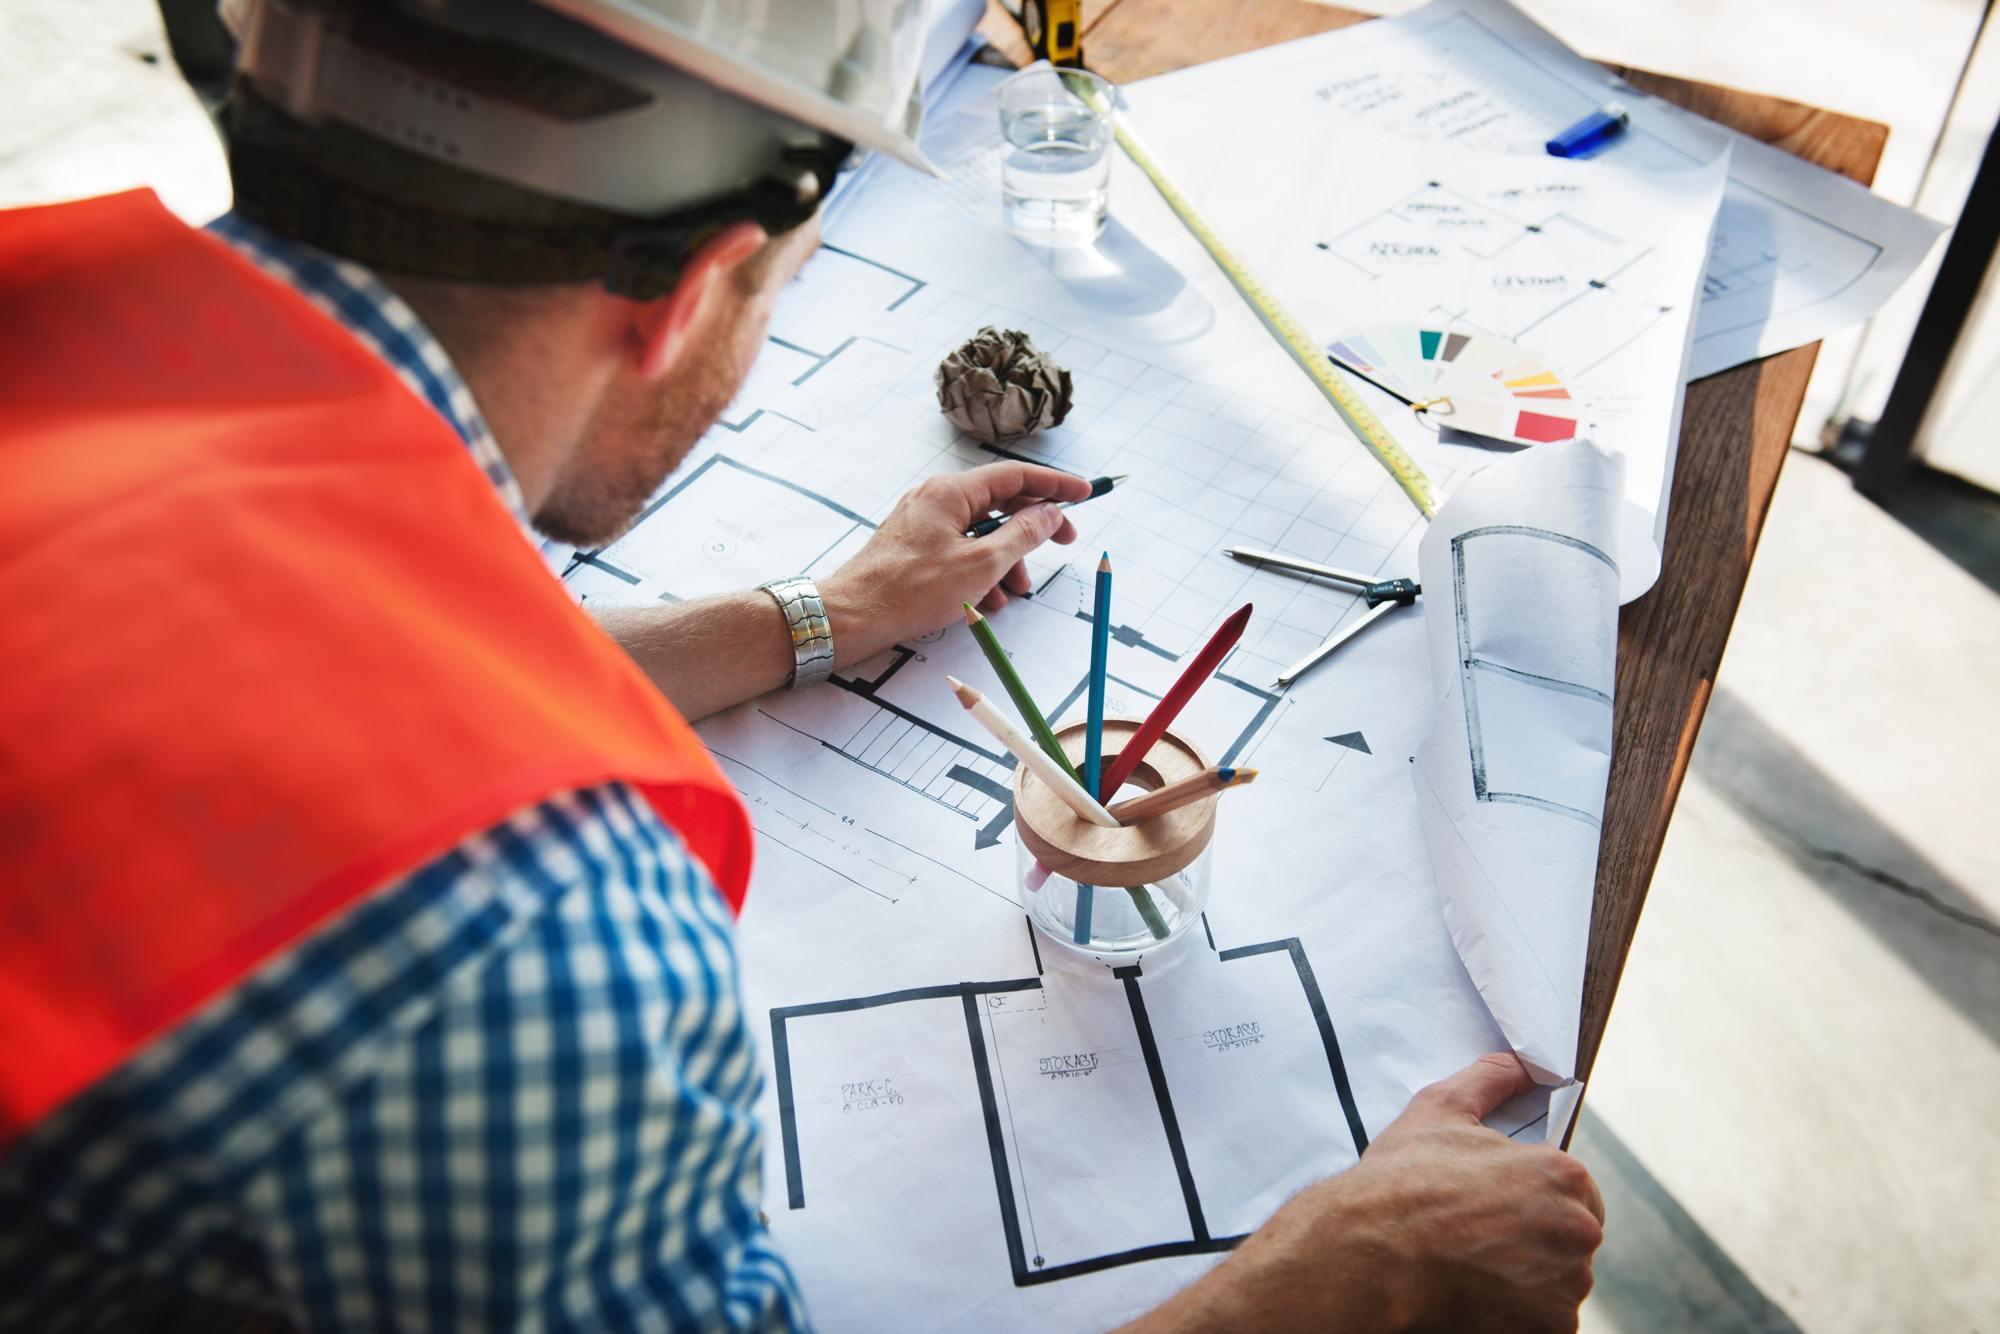 Home appraiser reviewing blueprints after appraisal.